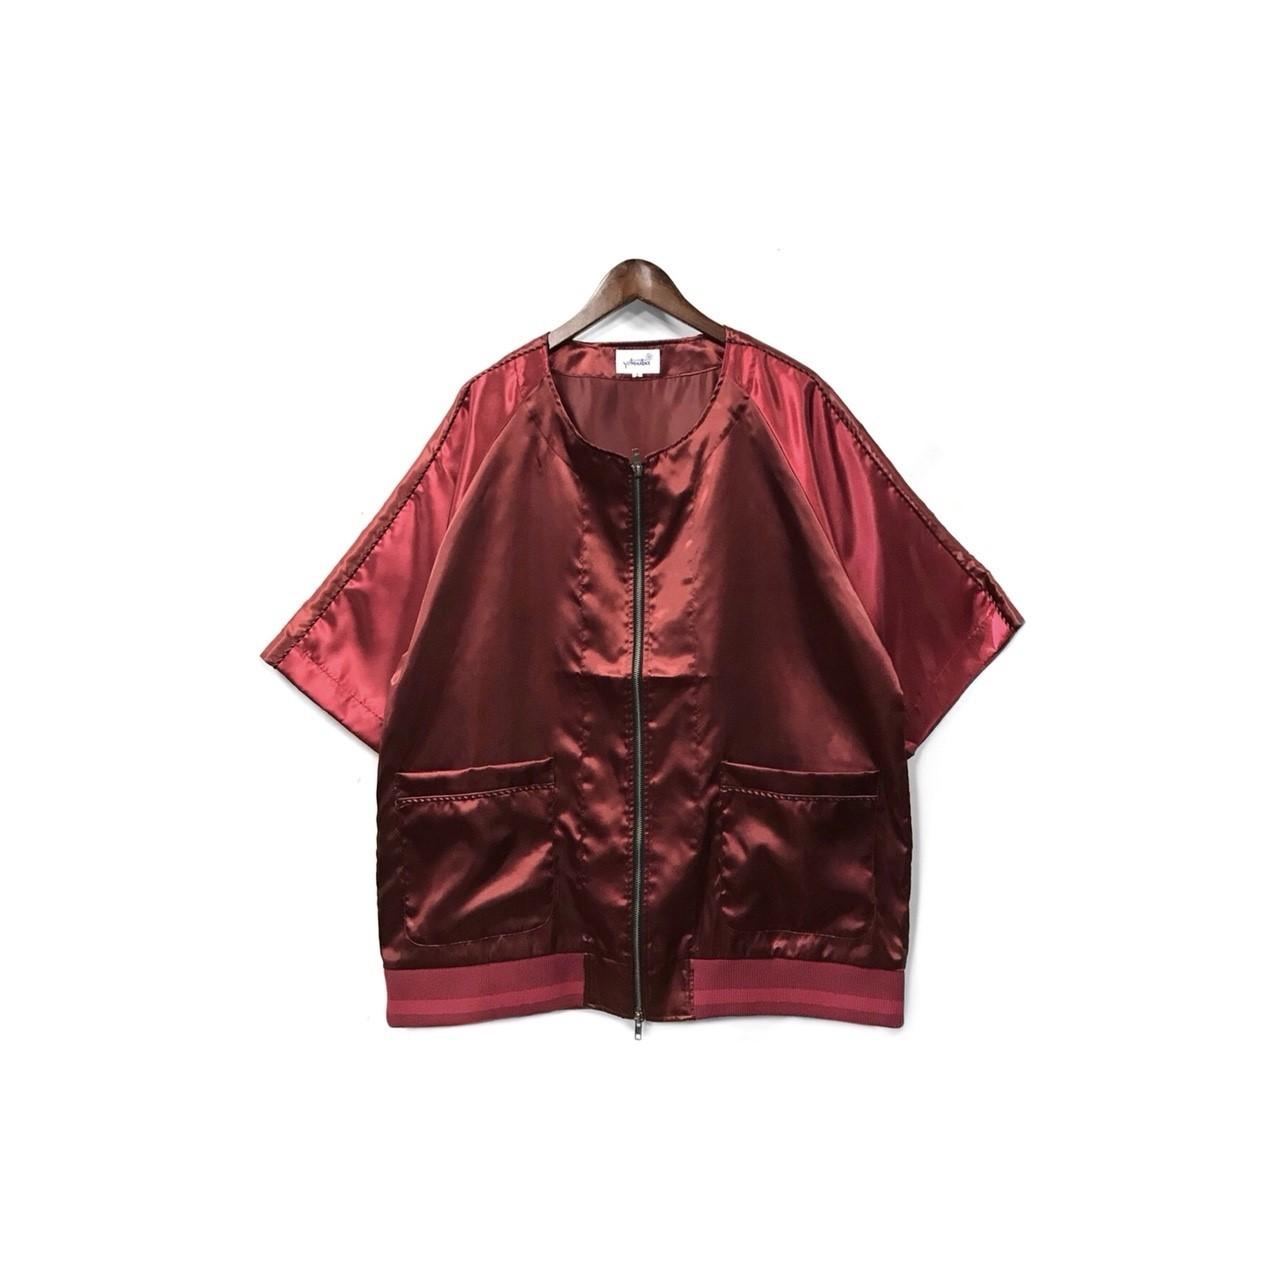 yotsuba - Souvenir baseball Shirt / Wine Red ¥26000+tax